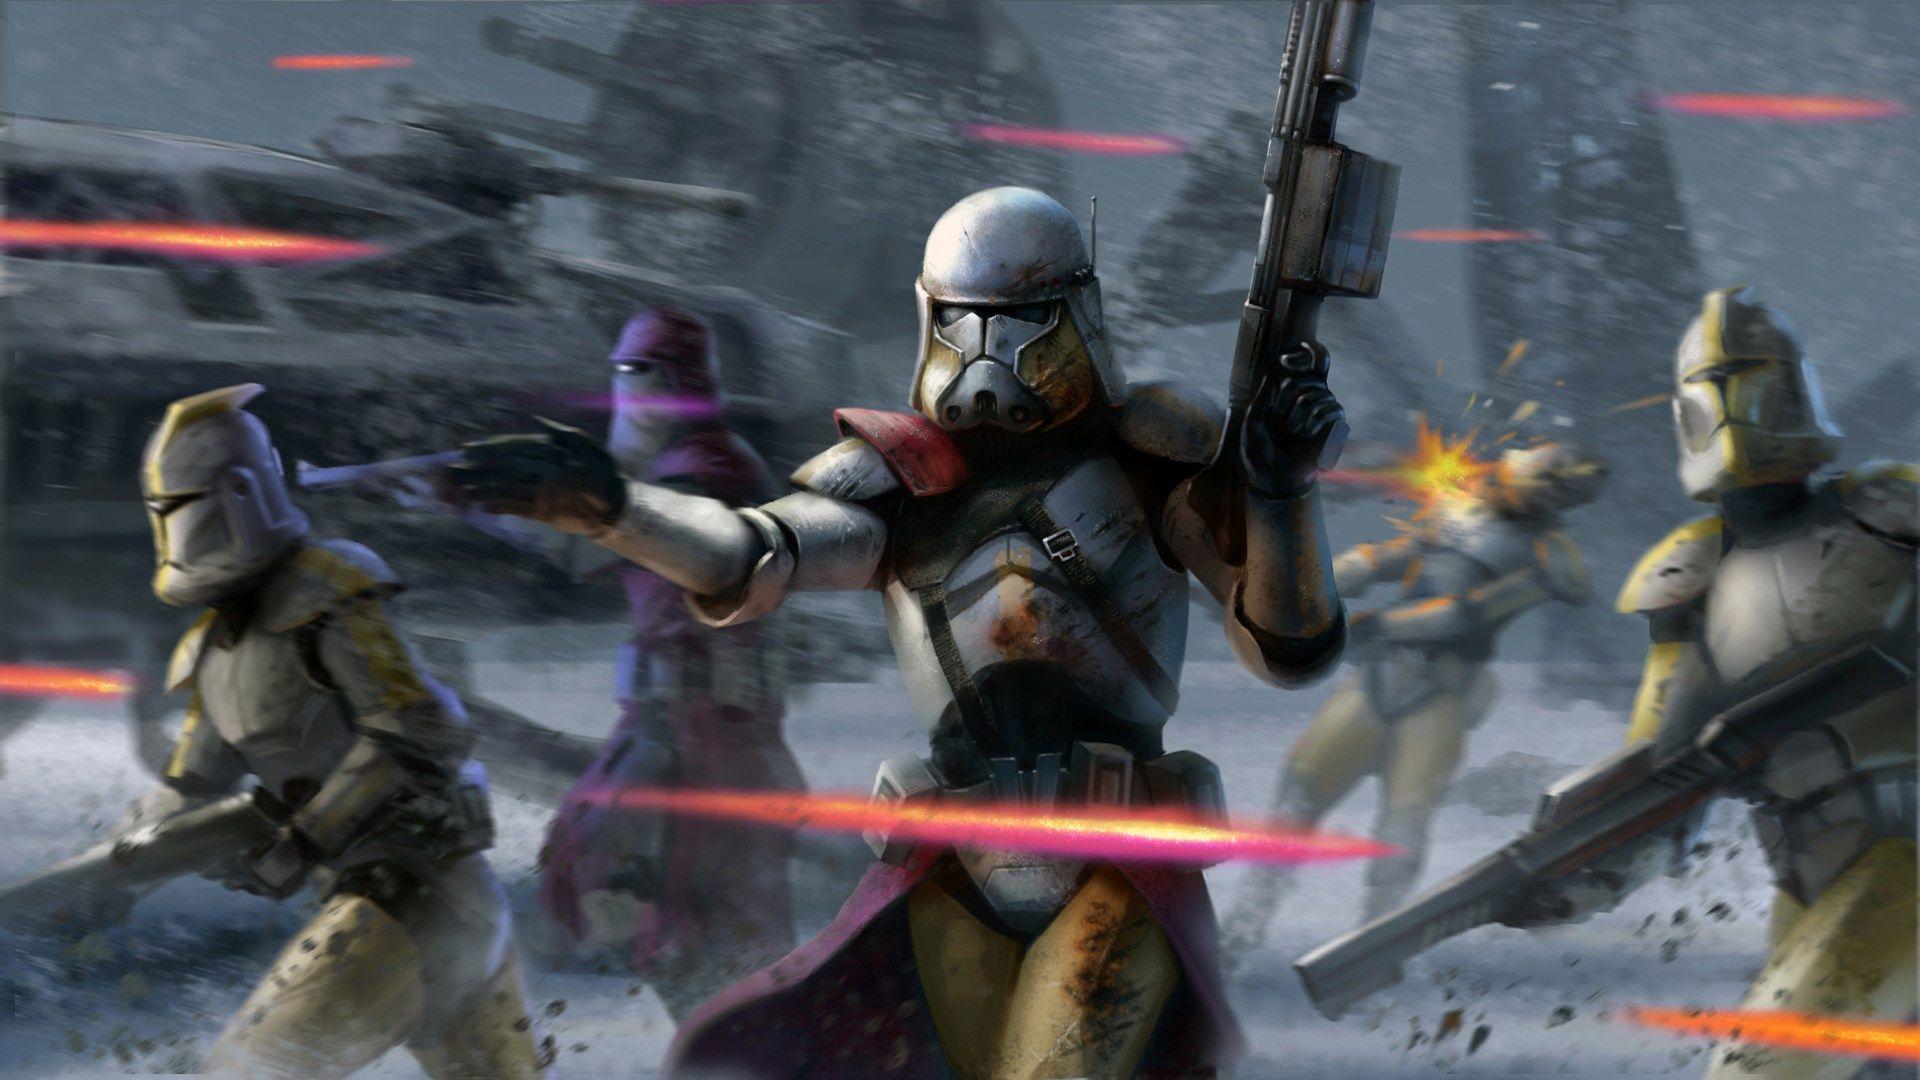 1920x1080 High Resolution Wallpaper Star Wars Star Wars Wallpaper Star Wars Empire Star Wars Clone Wars